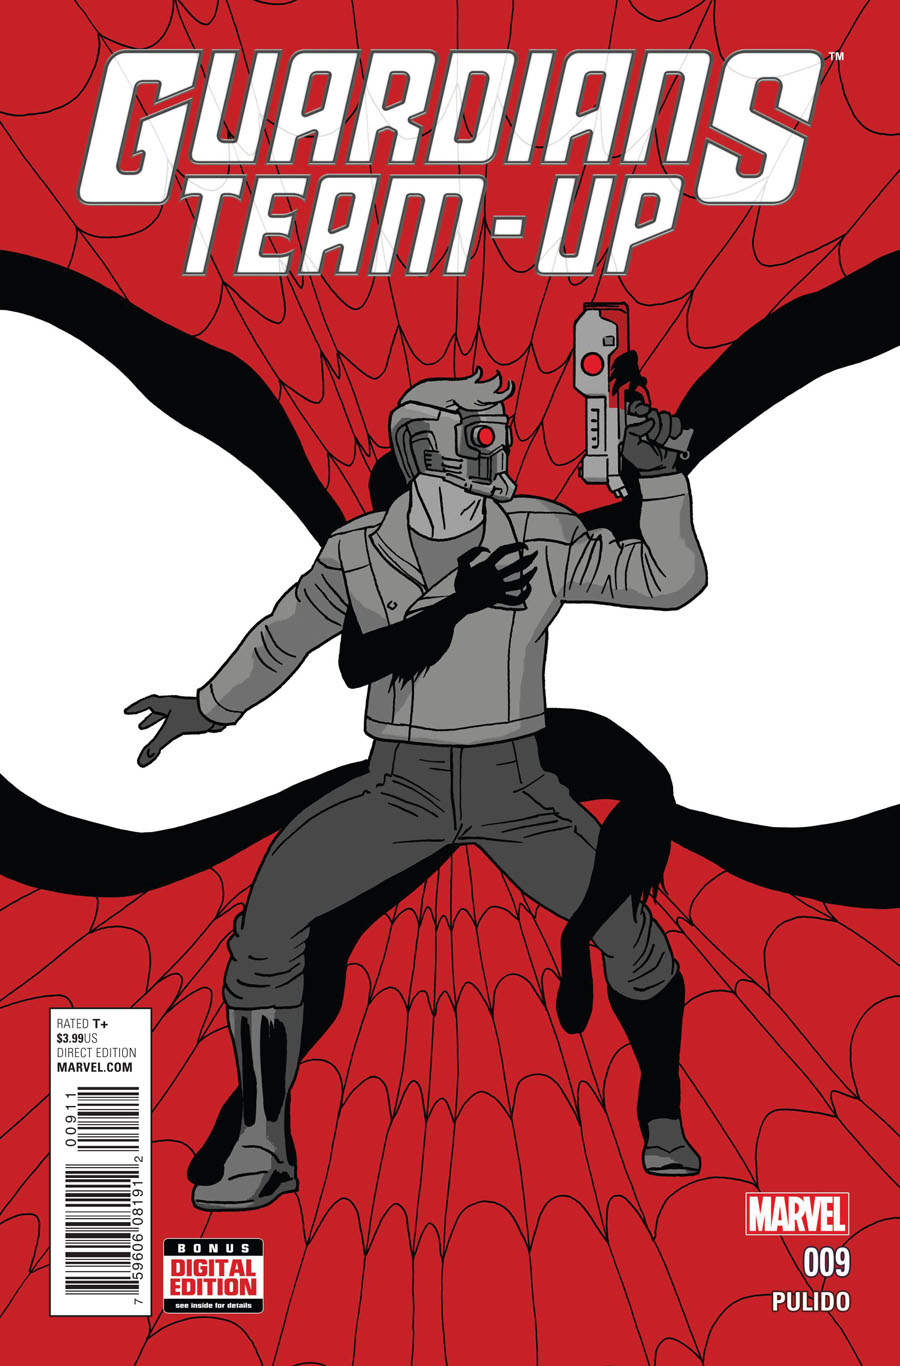 Guardians Team-Up #9